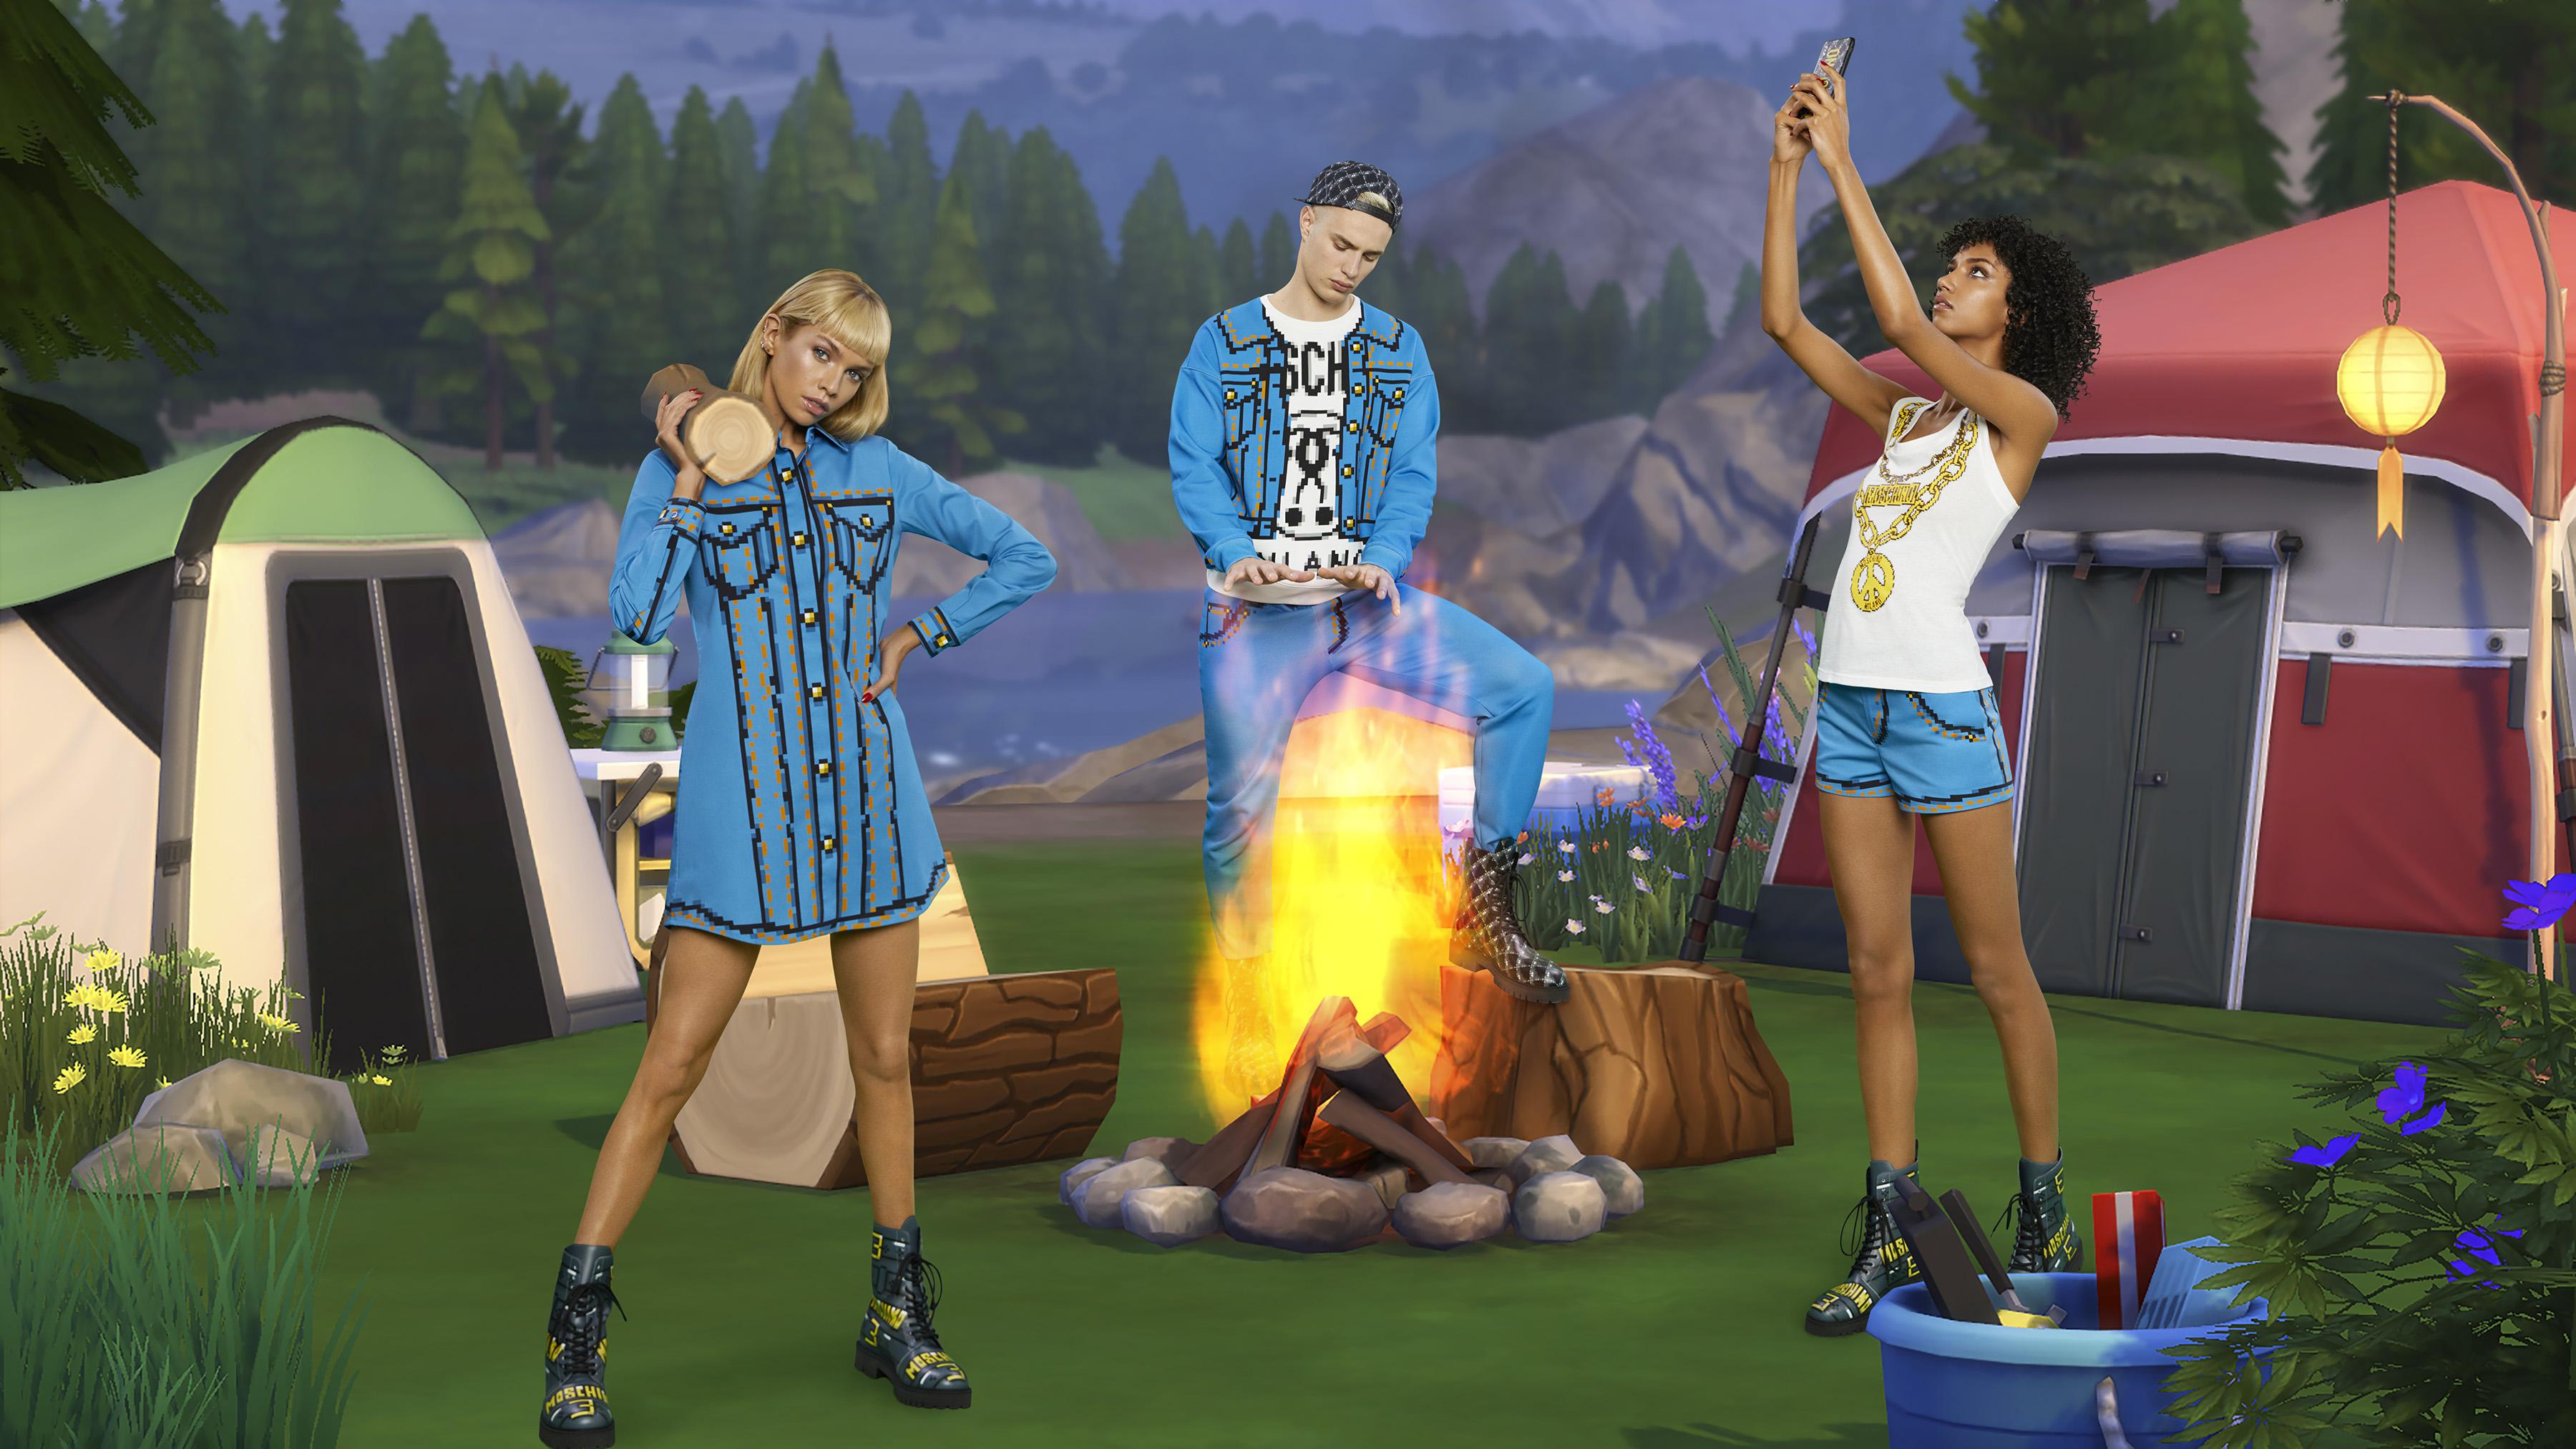 Moschino Sims Collaboration When High Fashion Video Games Unite Fortune